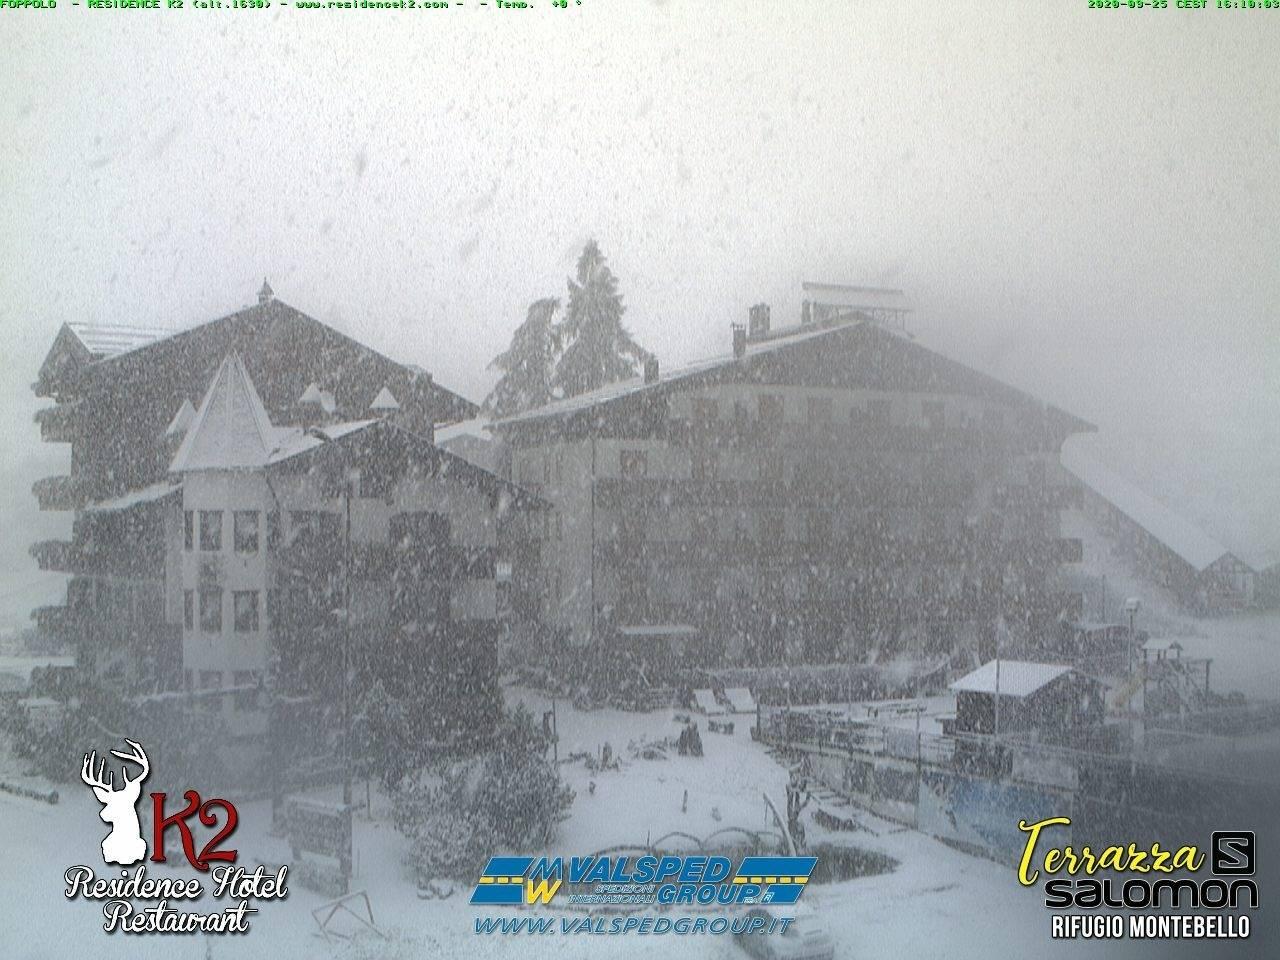 Cronaca meteo: neve copiosa a Foppolo